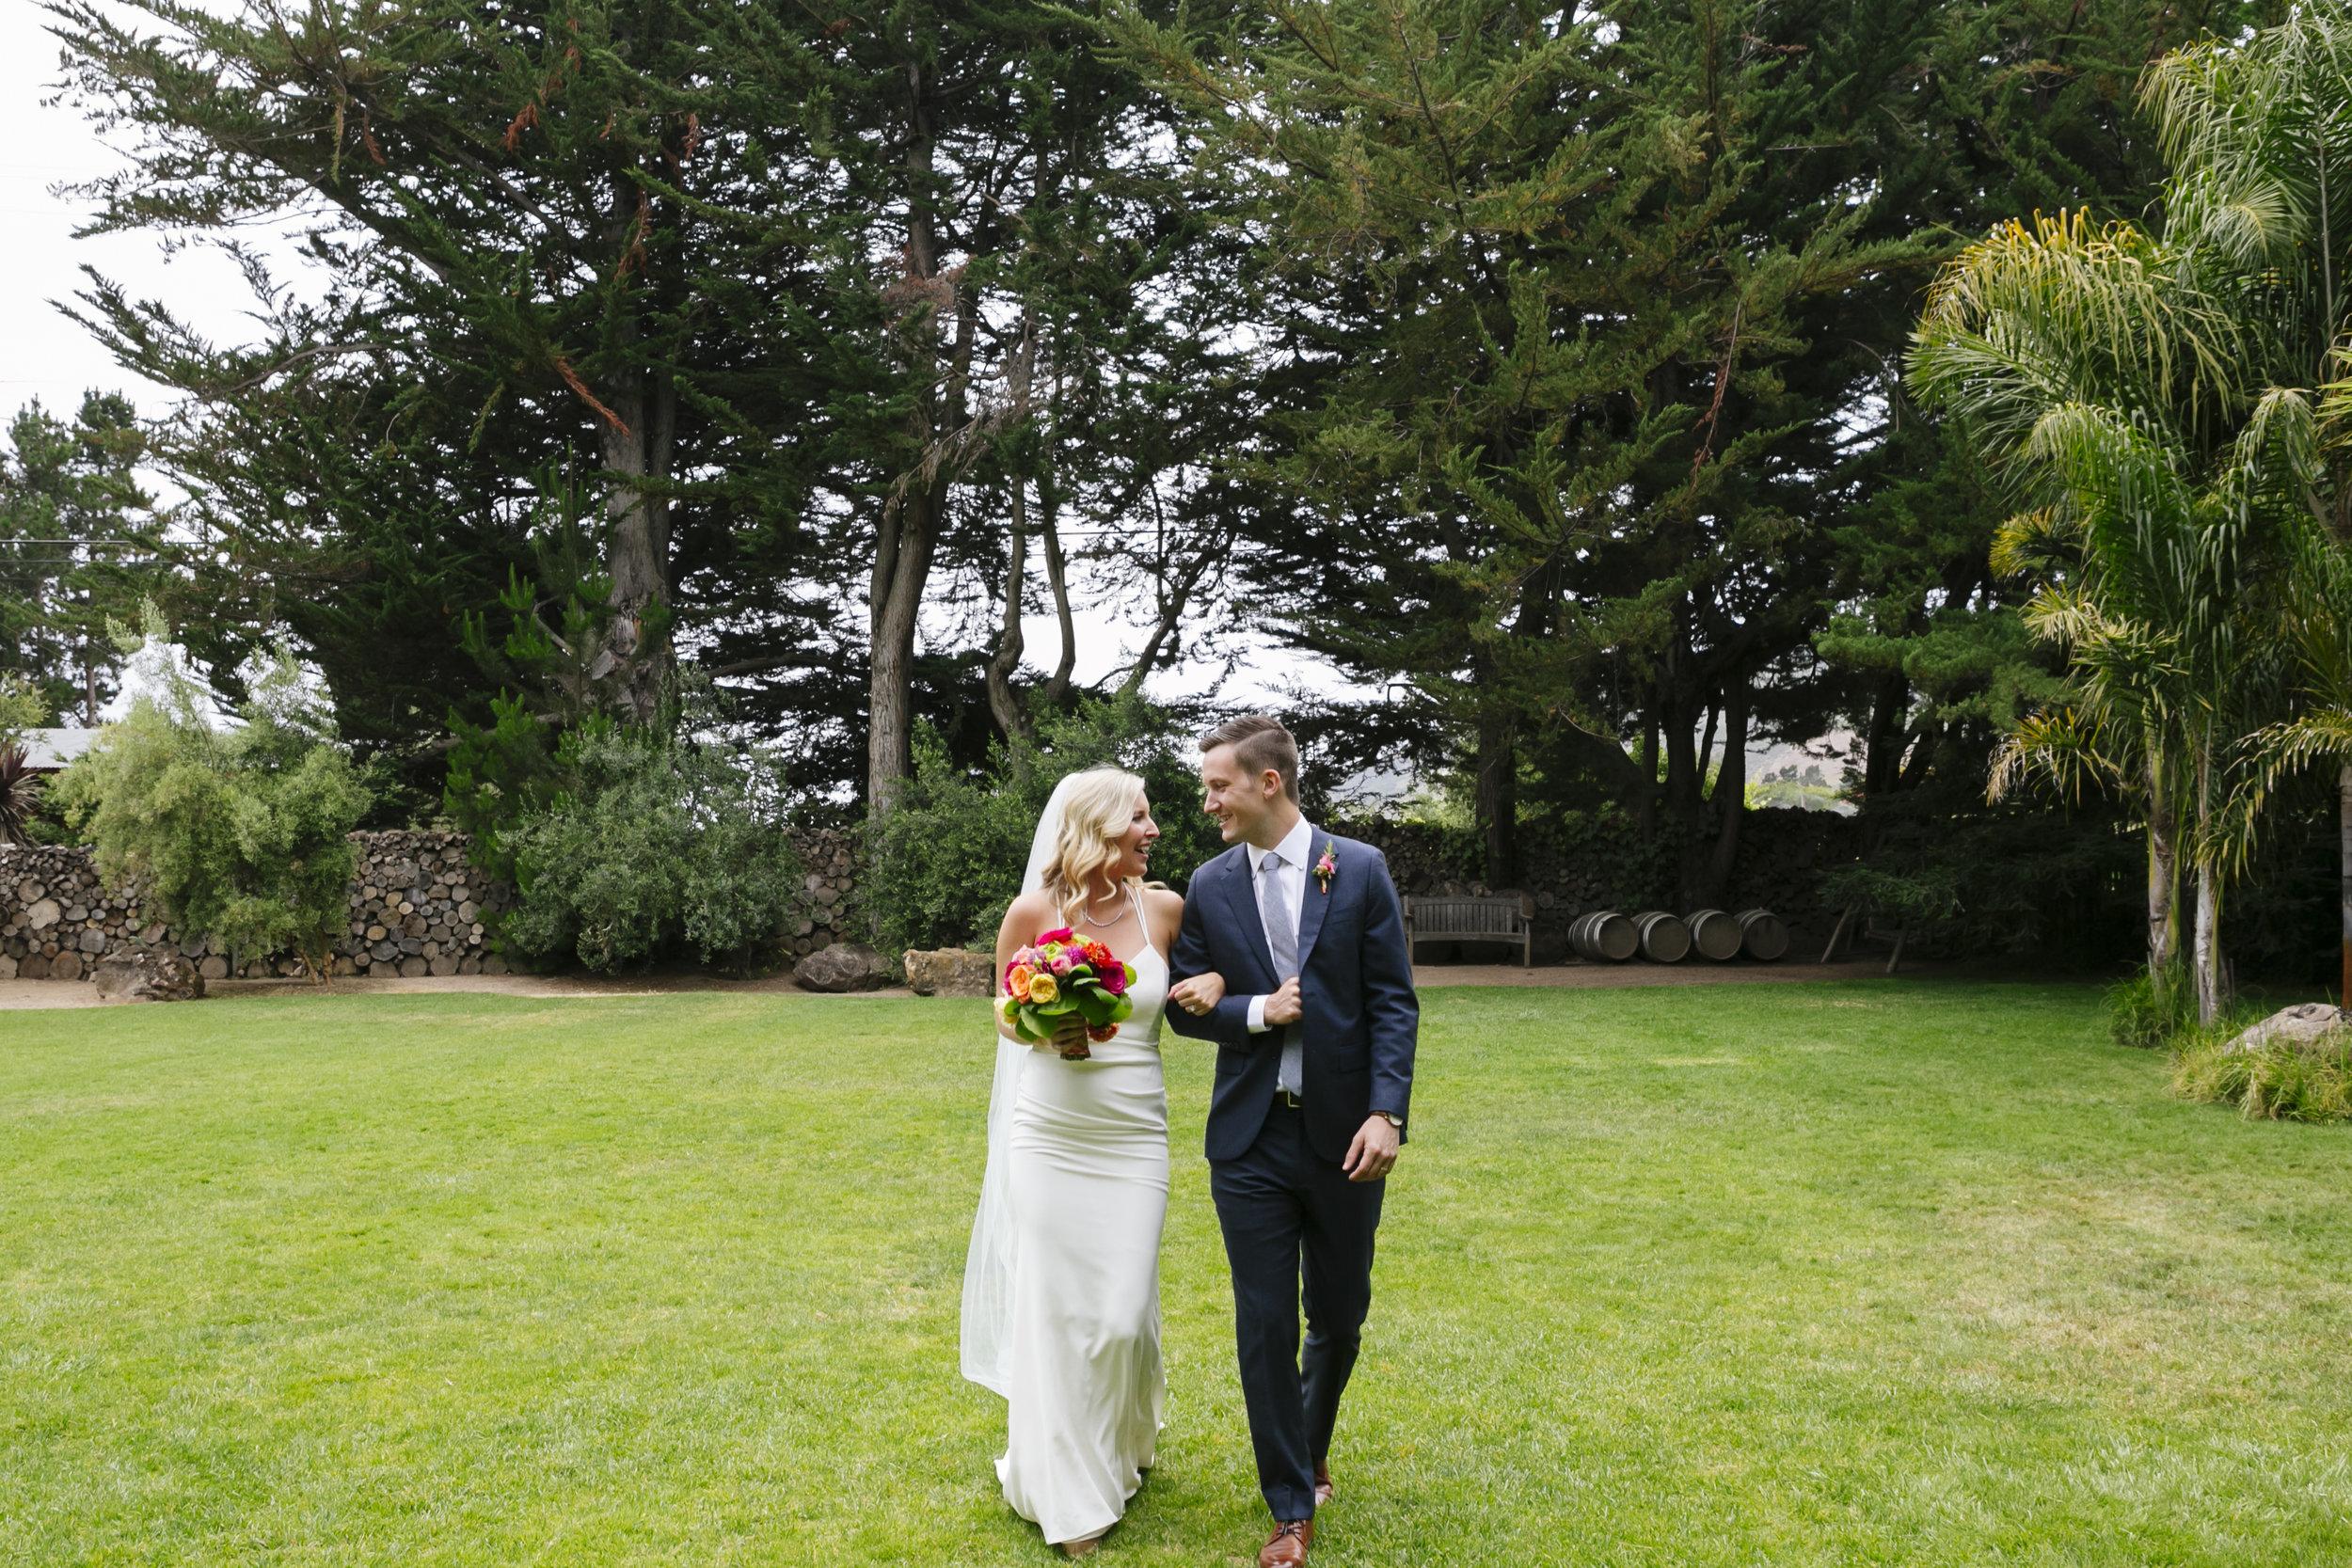 KateGarrett_WeddingPreview_KB_6817.jpg